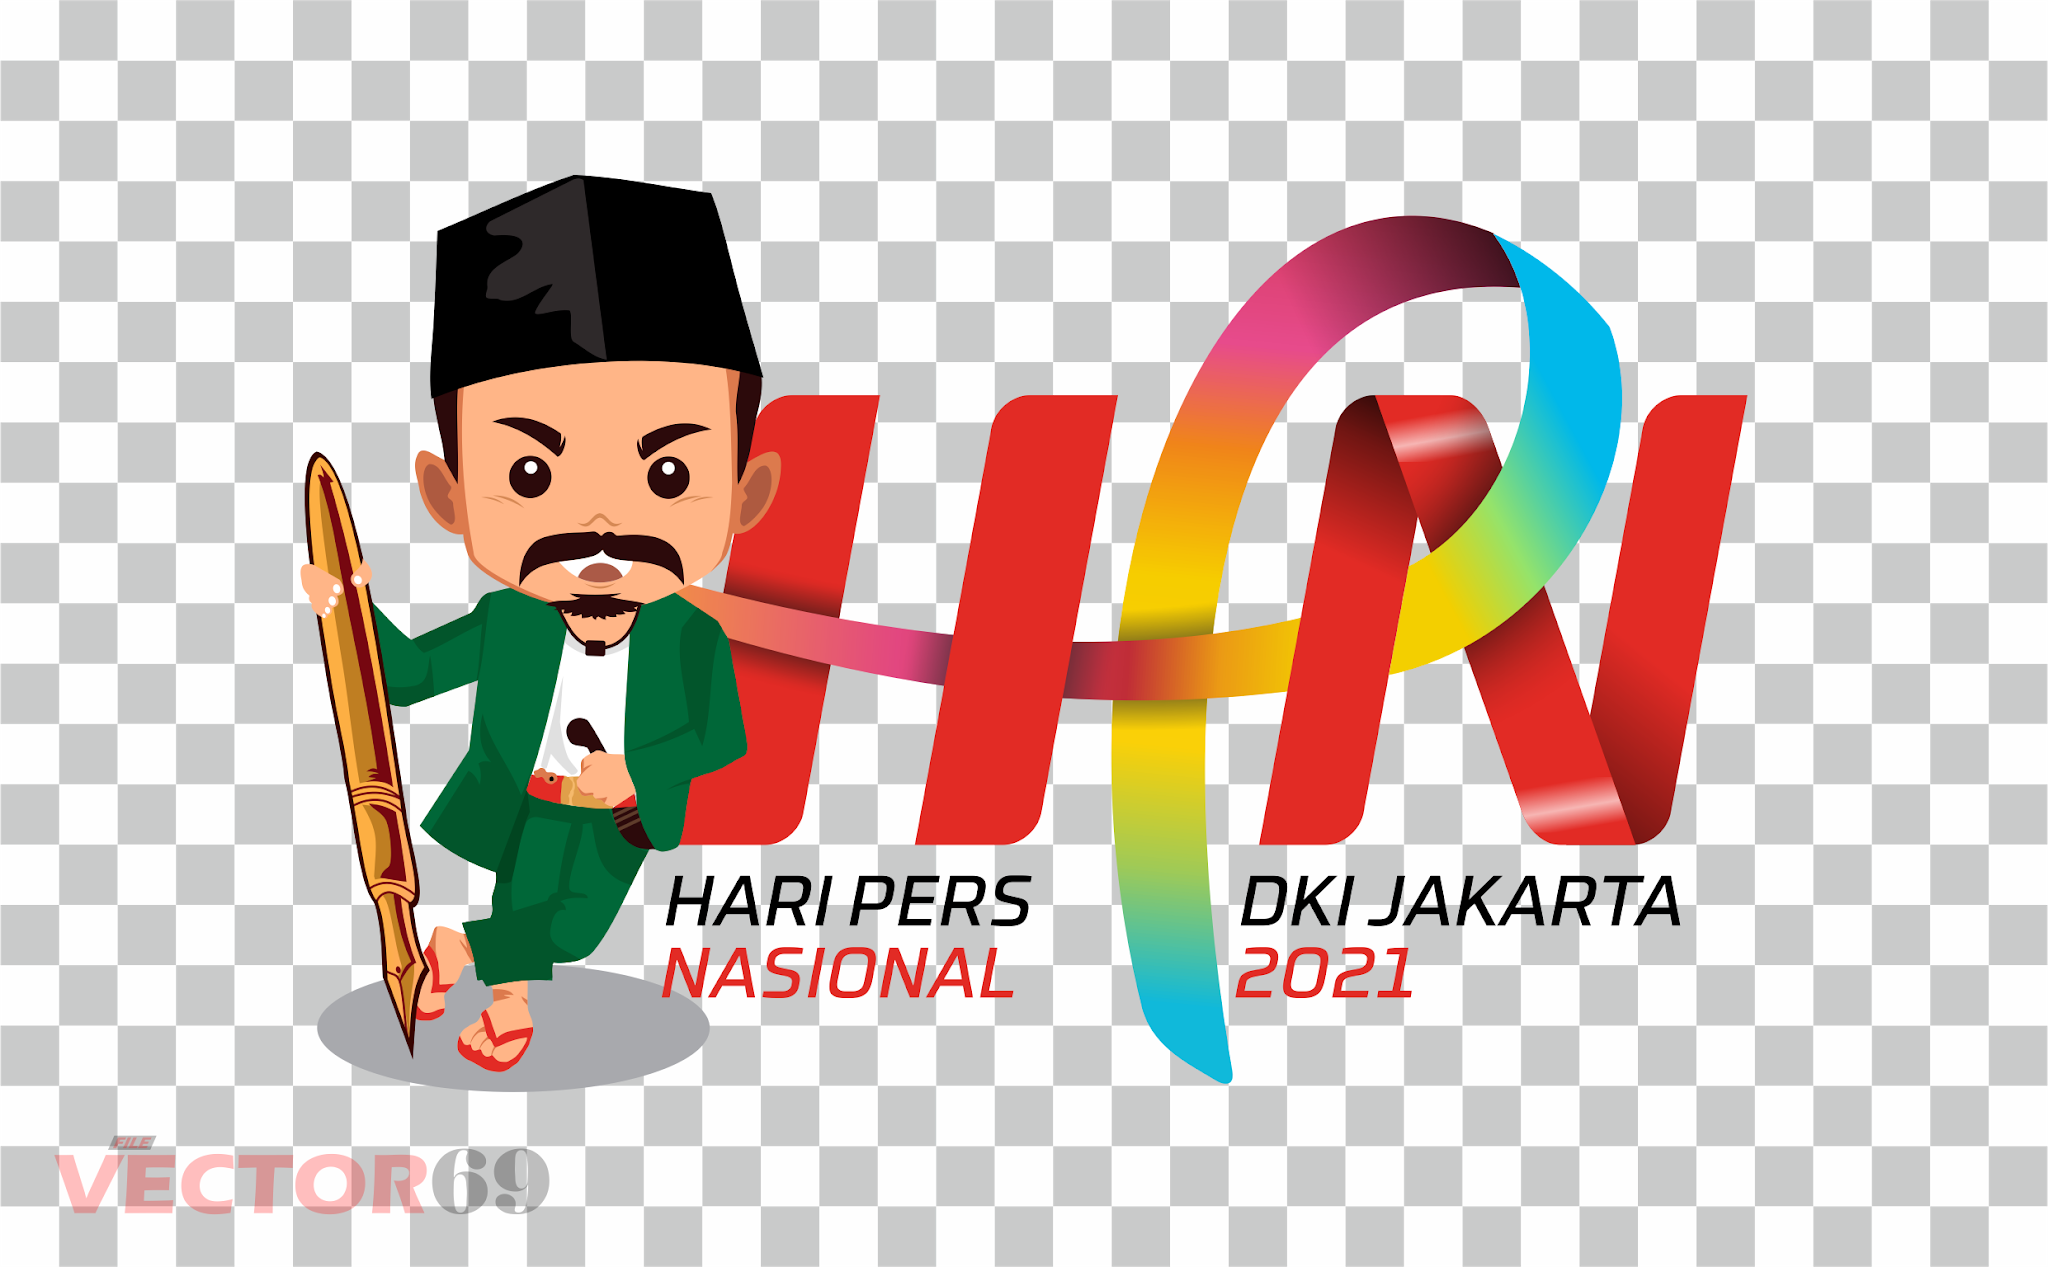 Hari Pers Nasional 2021 DKI Jakarta Logo - Download Vector File PNG (Portable Network Graphics)